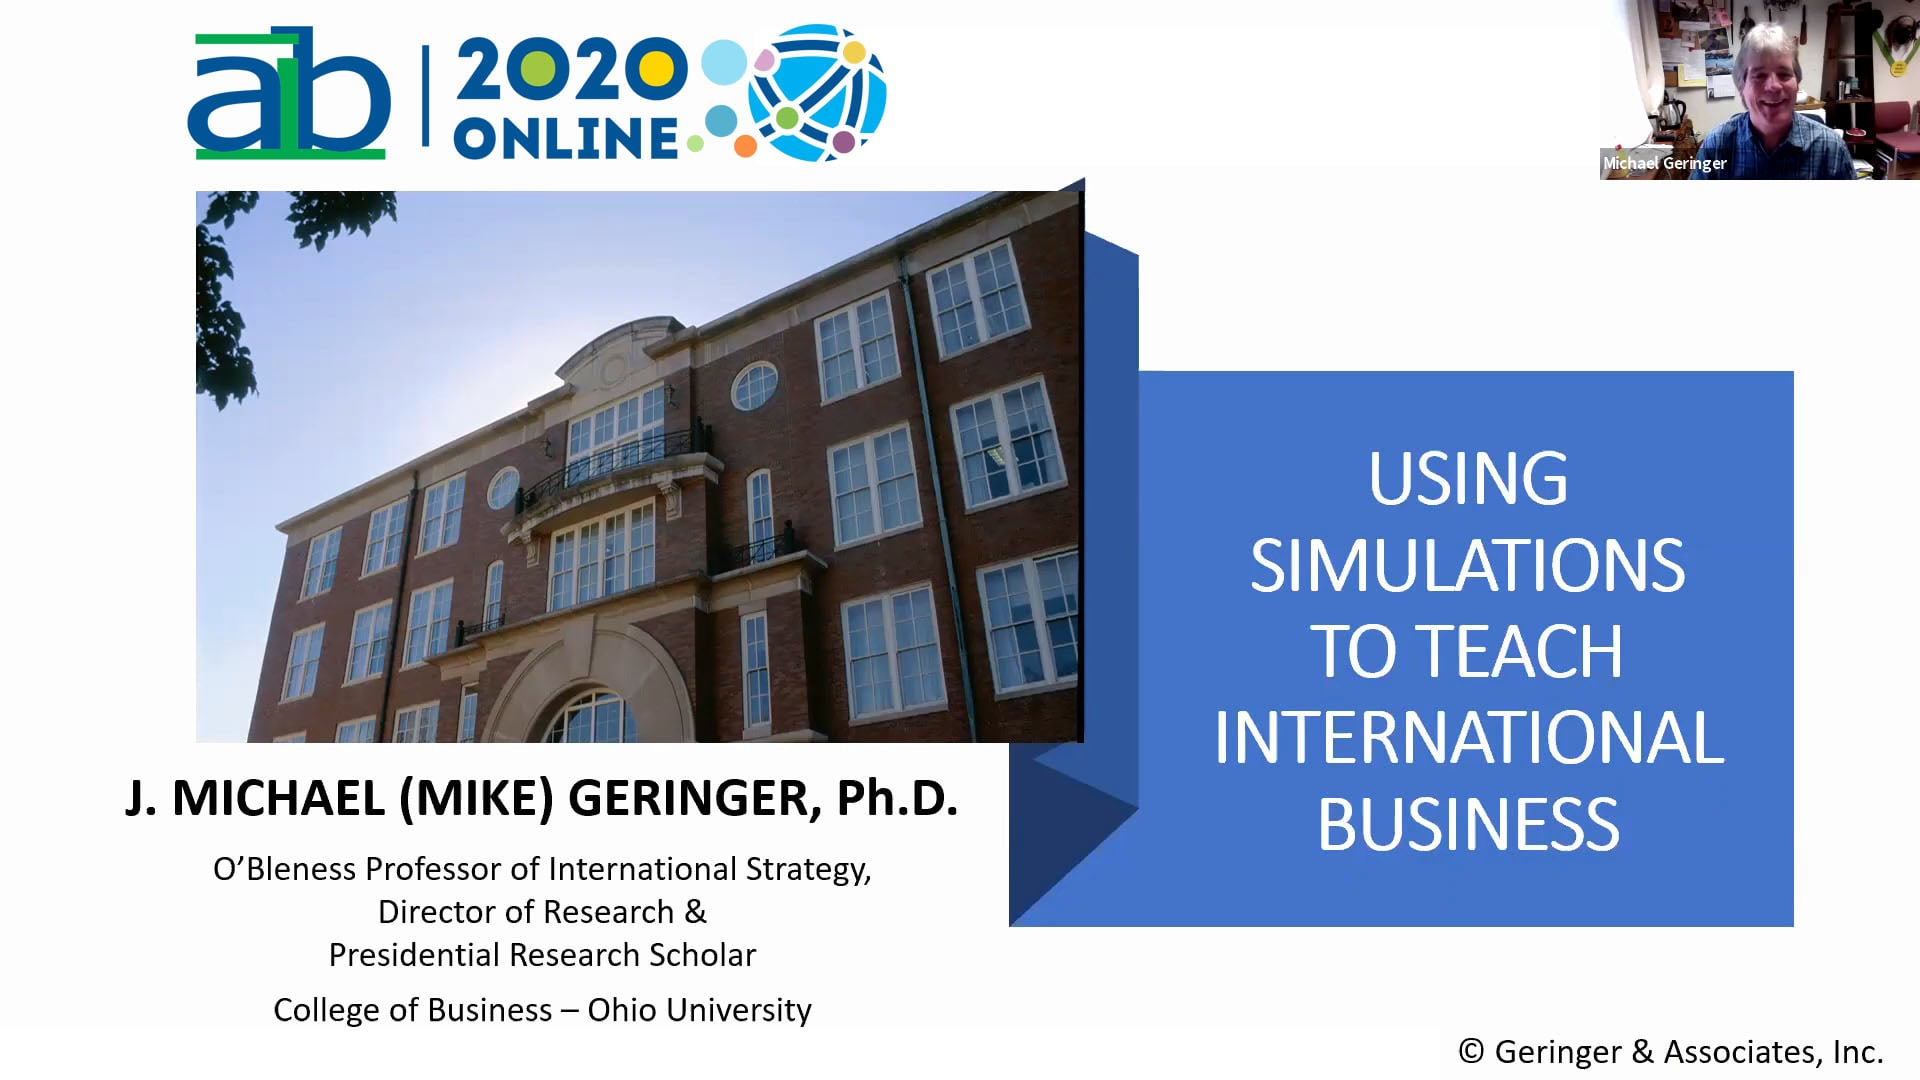 Mike Geringer AIB 2020 Showcase Session